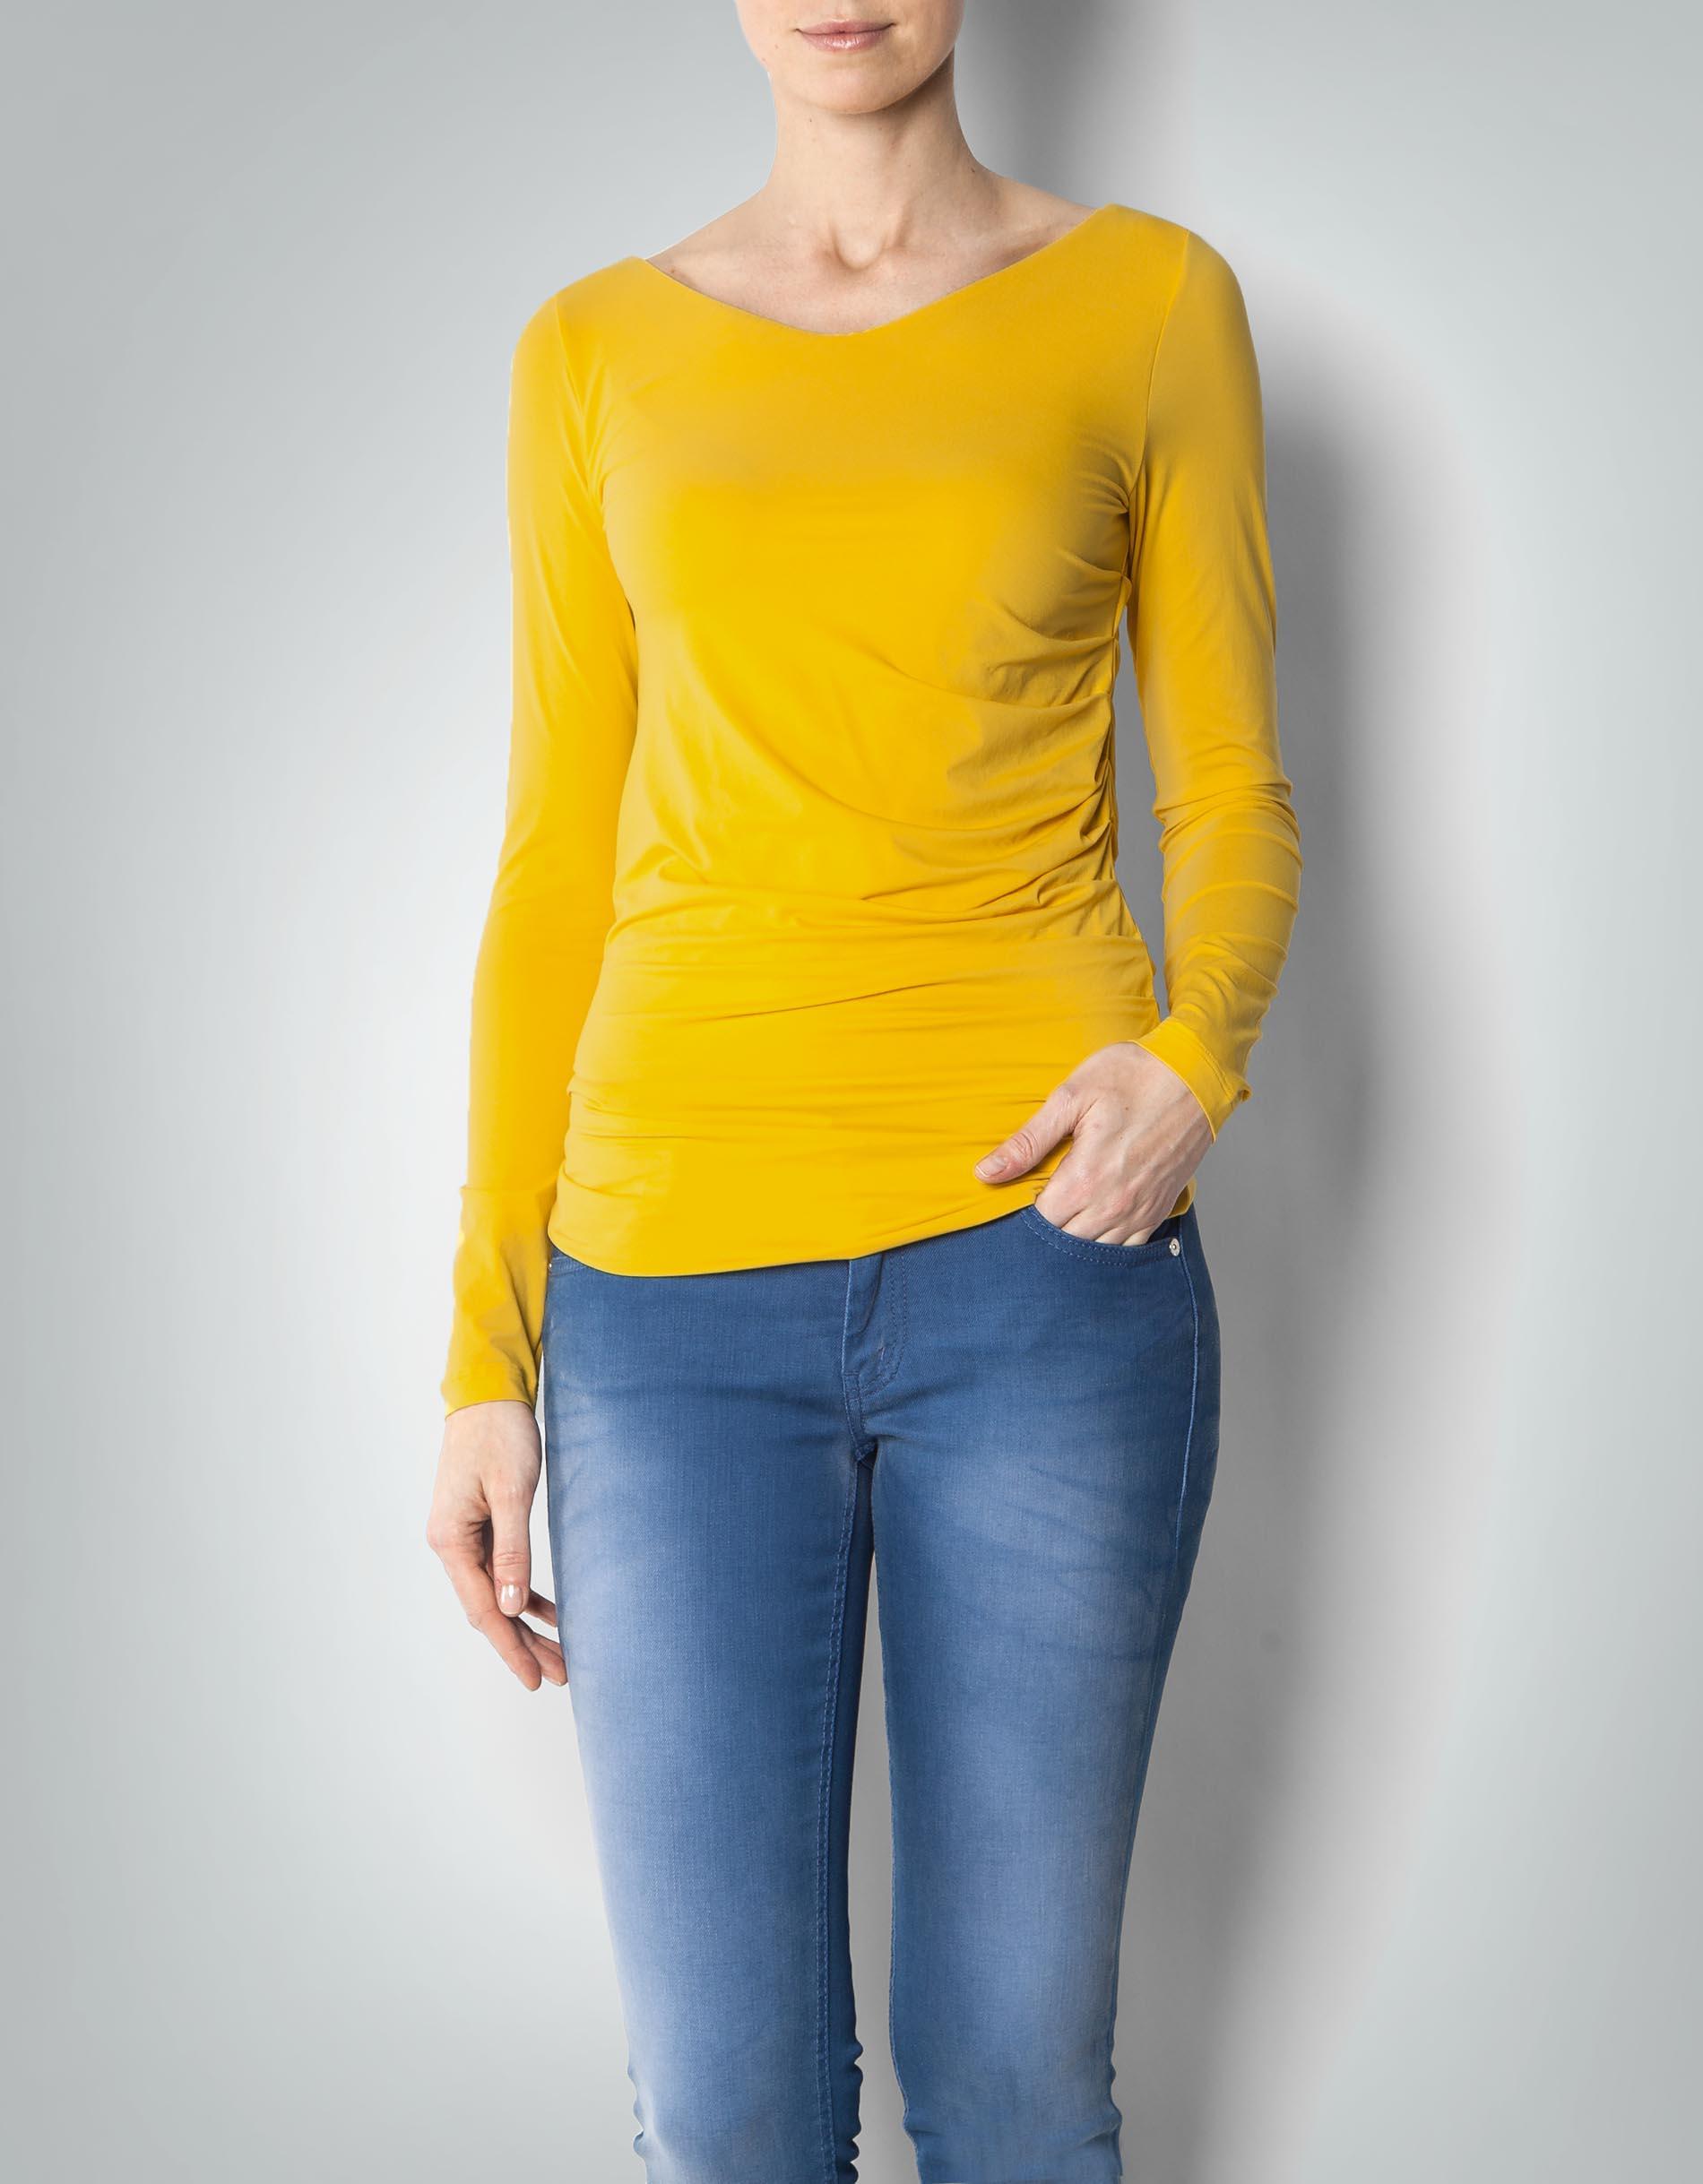 cinque damen t shirt cimarta gelb longsleeve mit. Black Bedroom Furniture Sets. Home Design Ideas